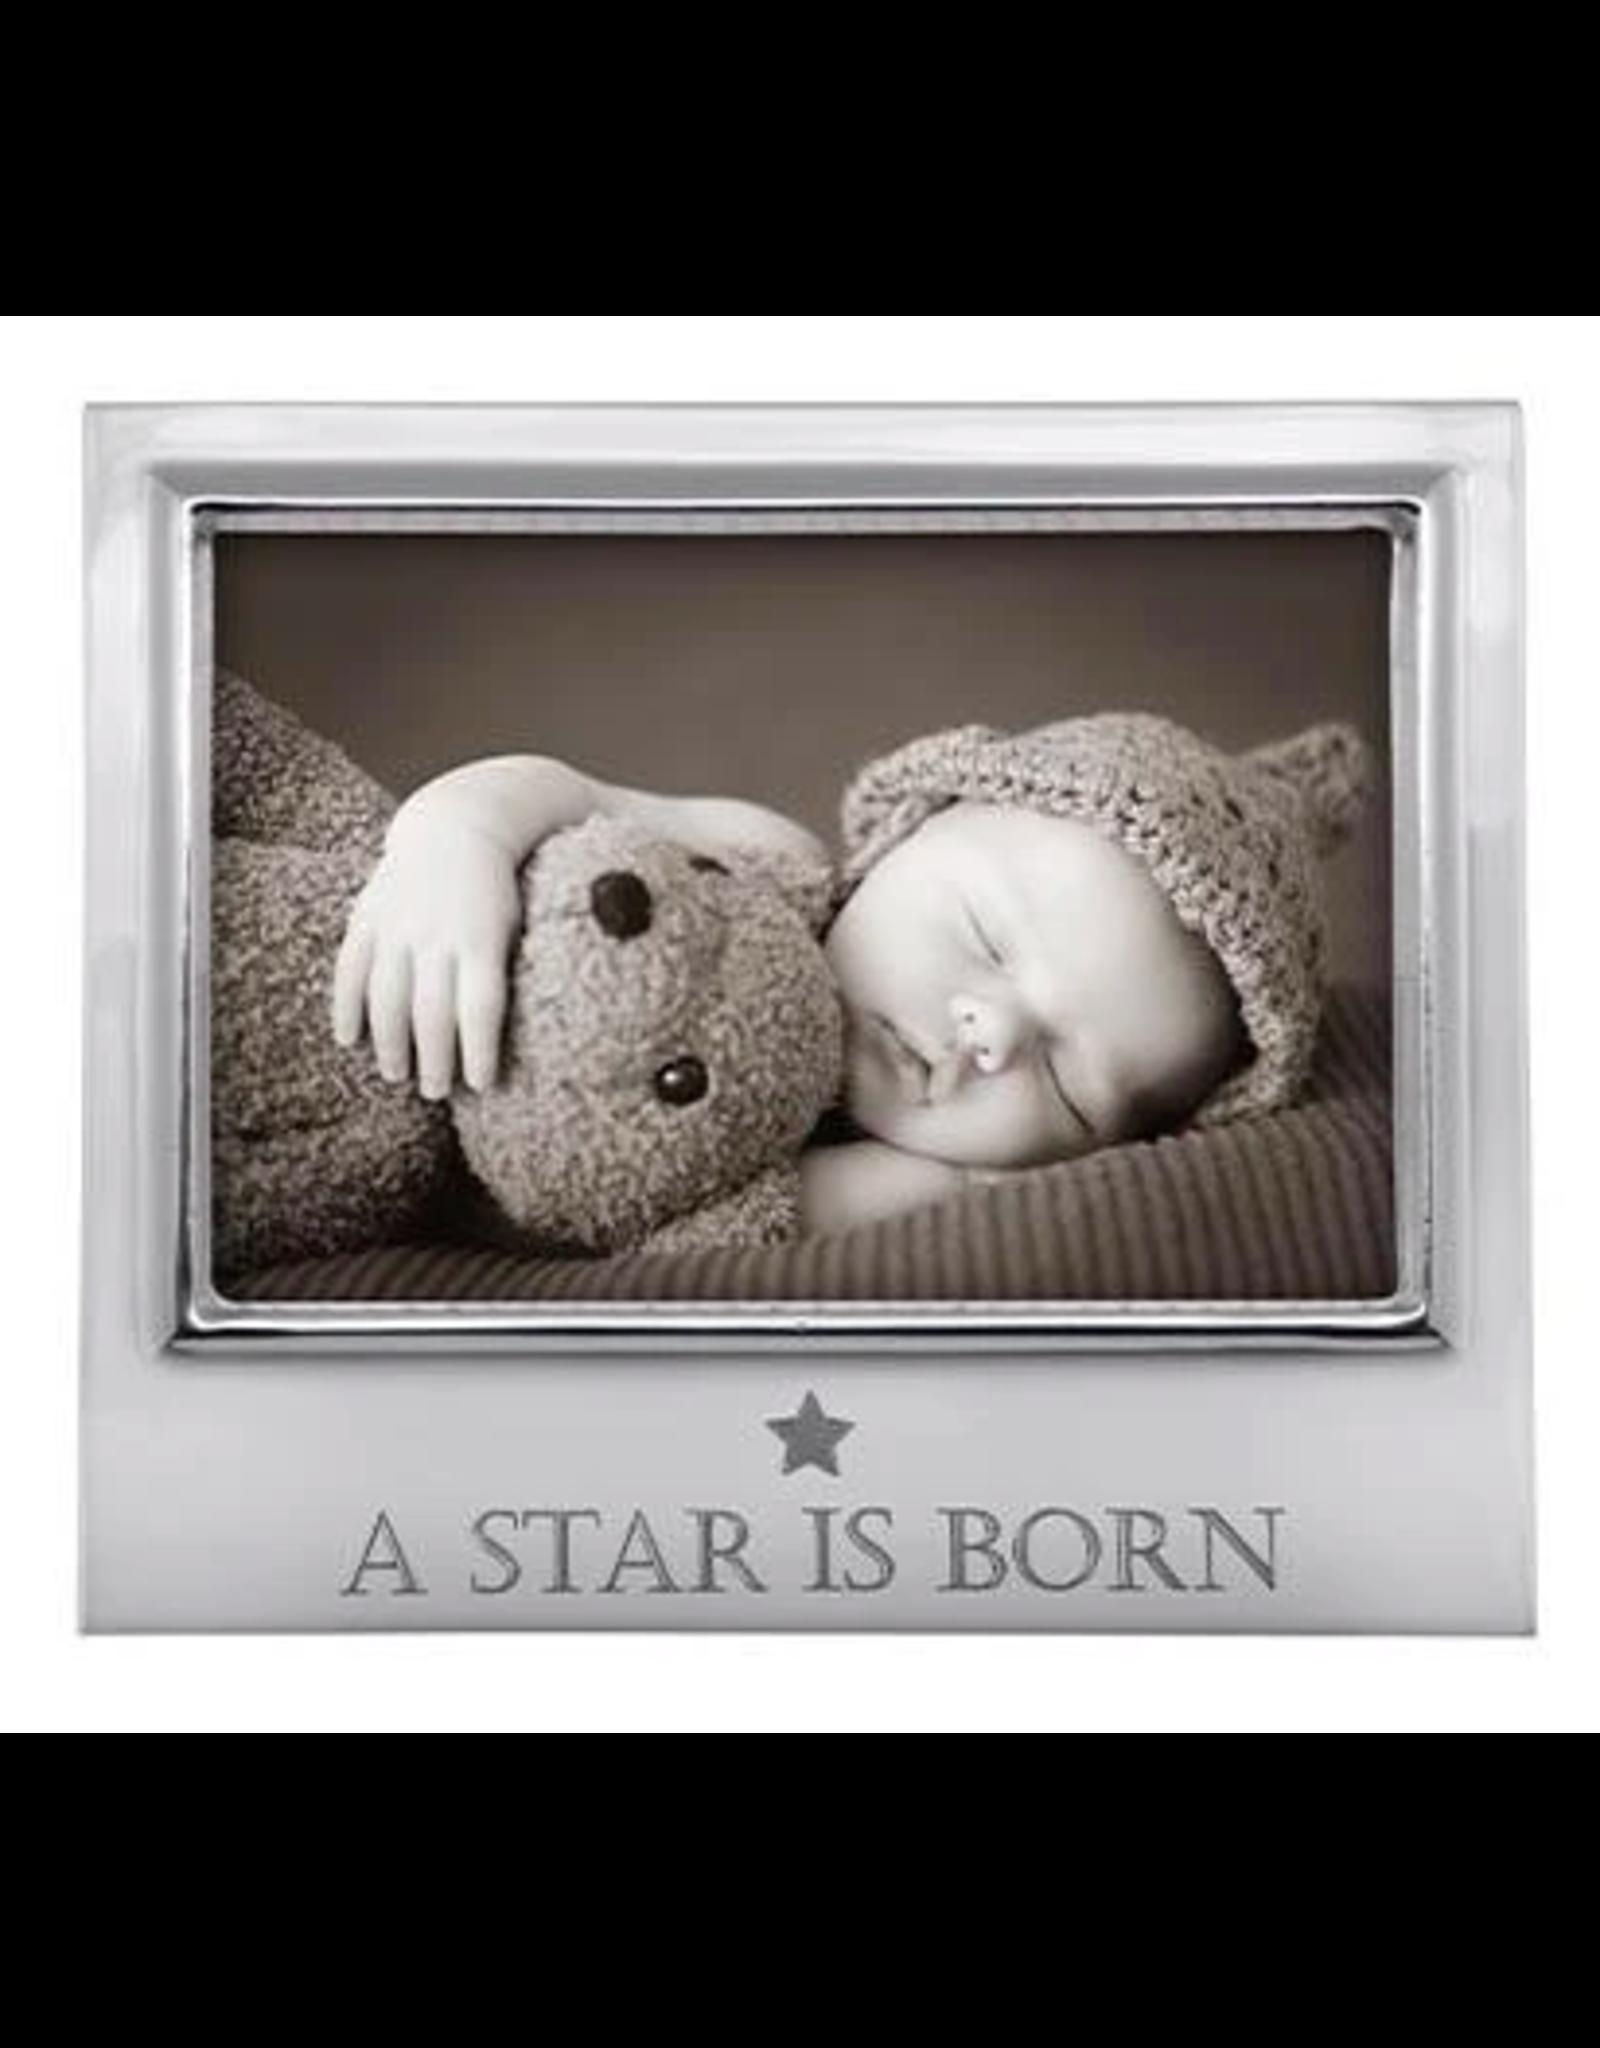 Mariposa A Star is Born Signature 4x6 Frame